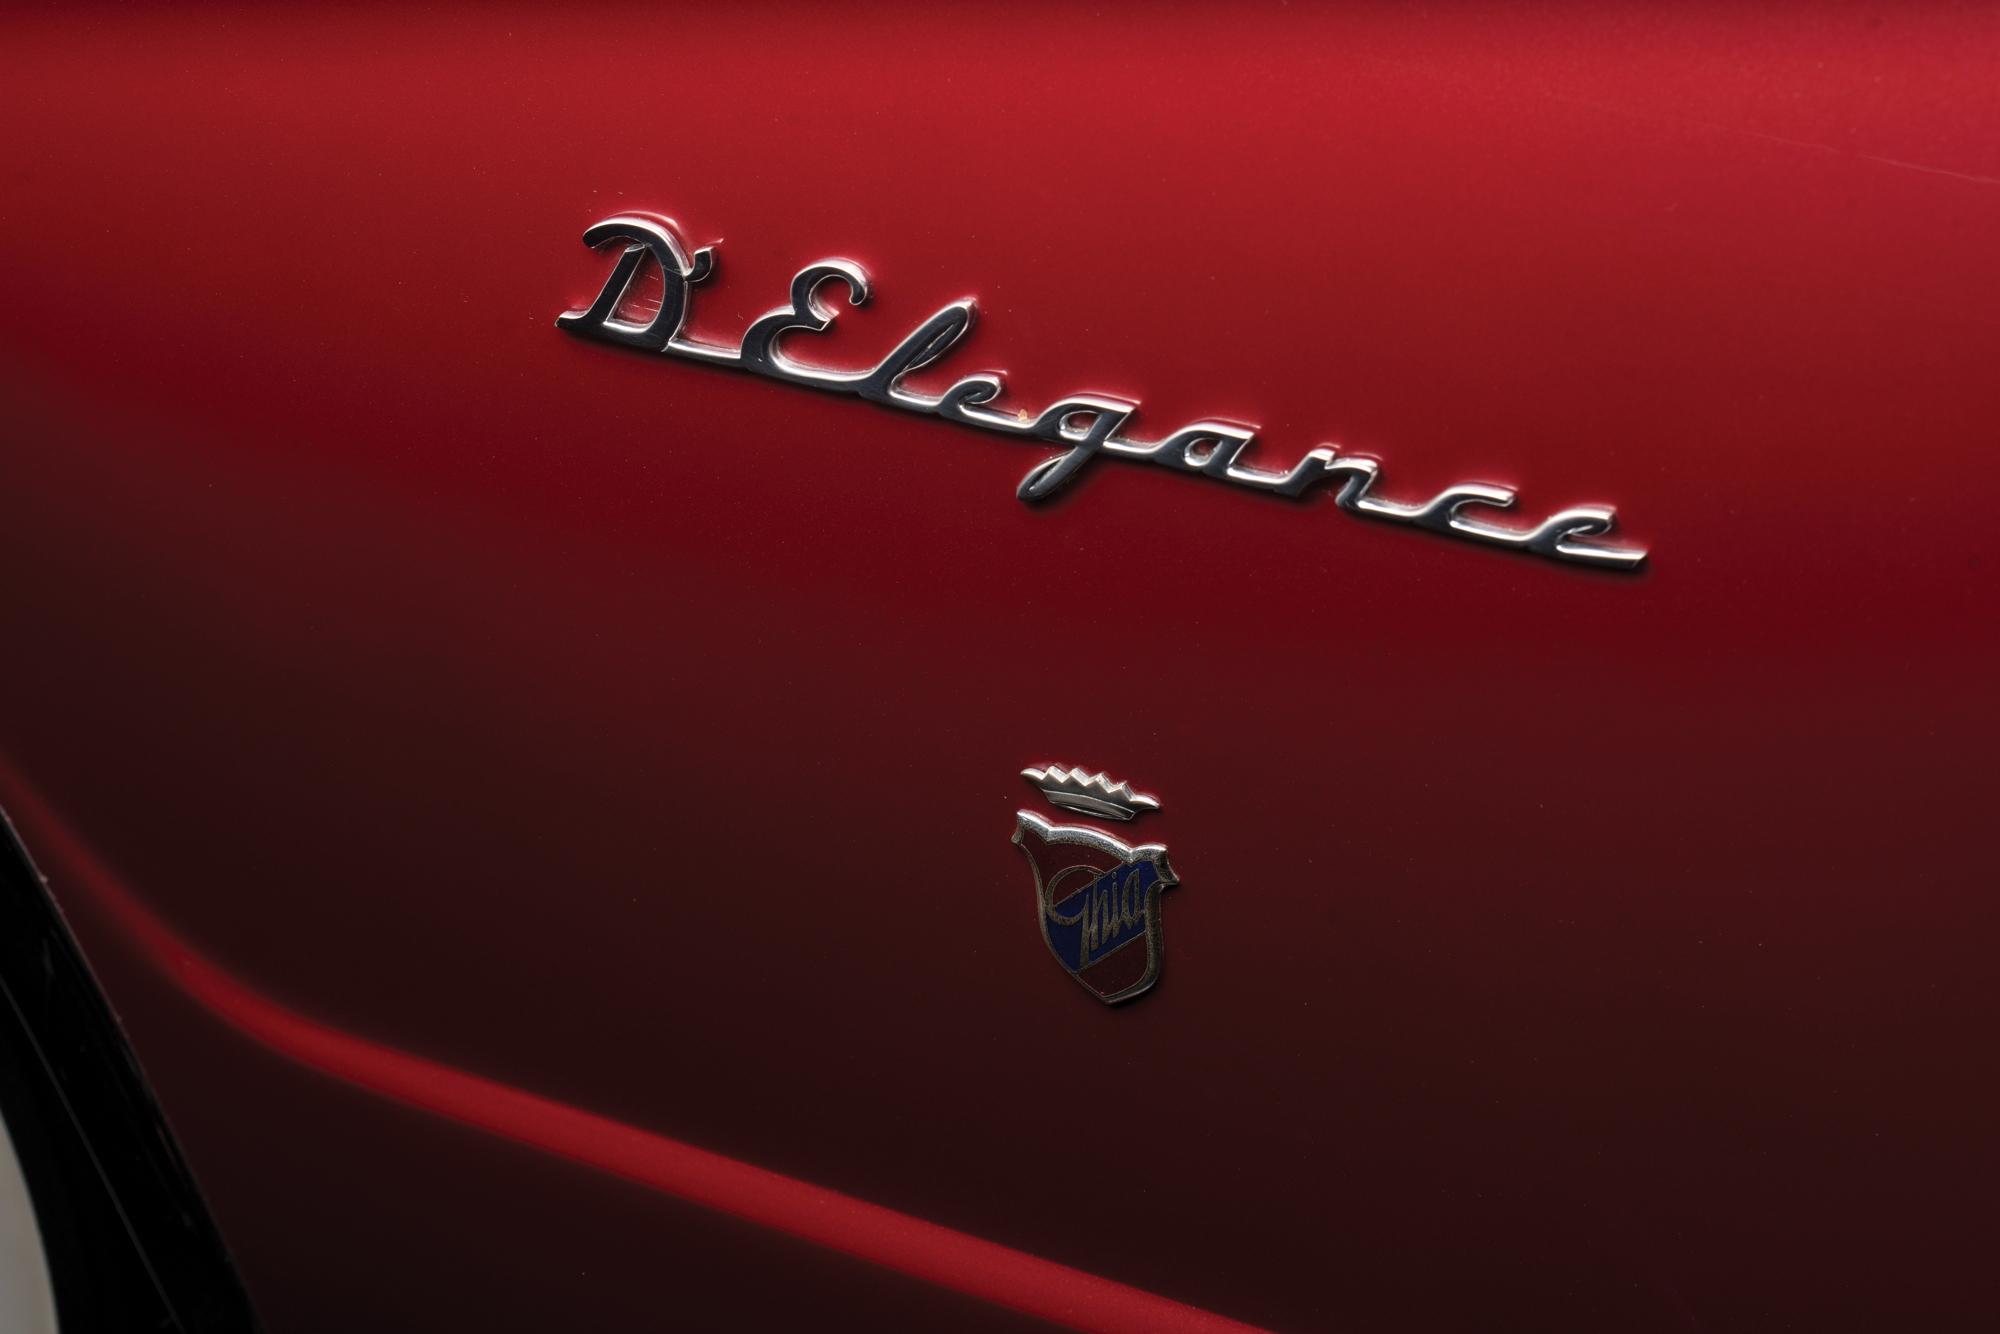 1952 Chrysler D'Elegance by Ghia badge